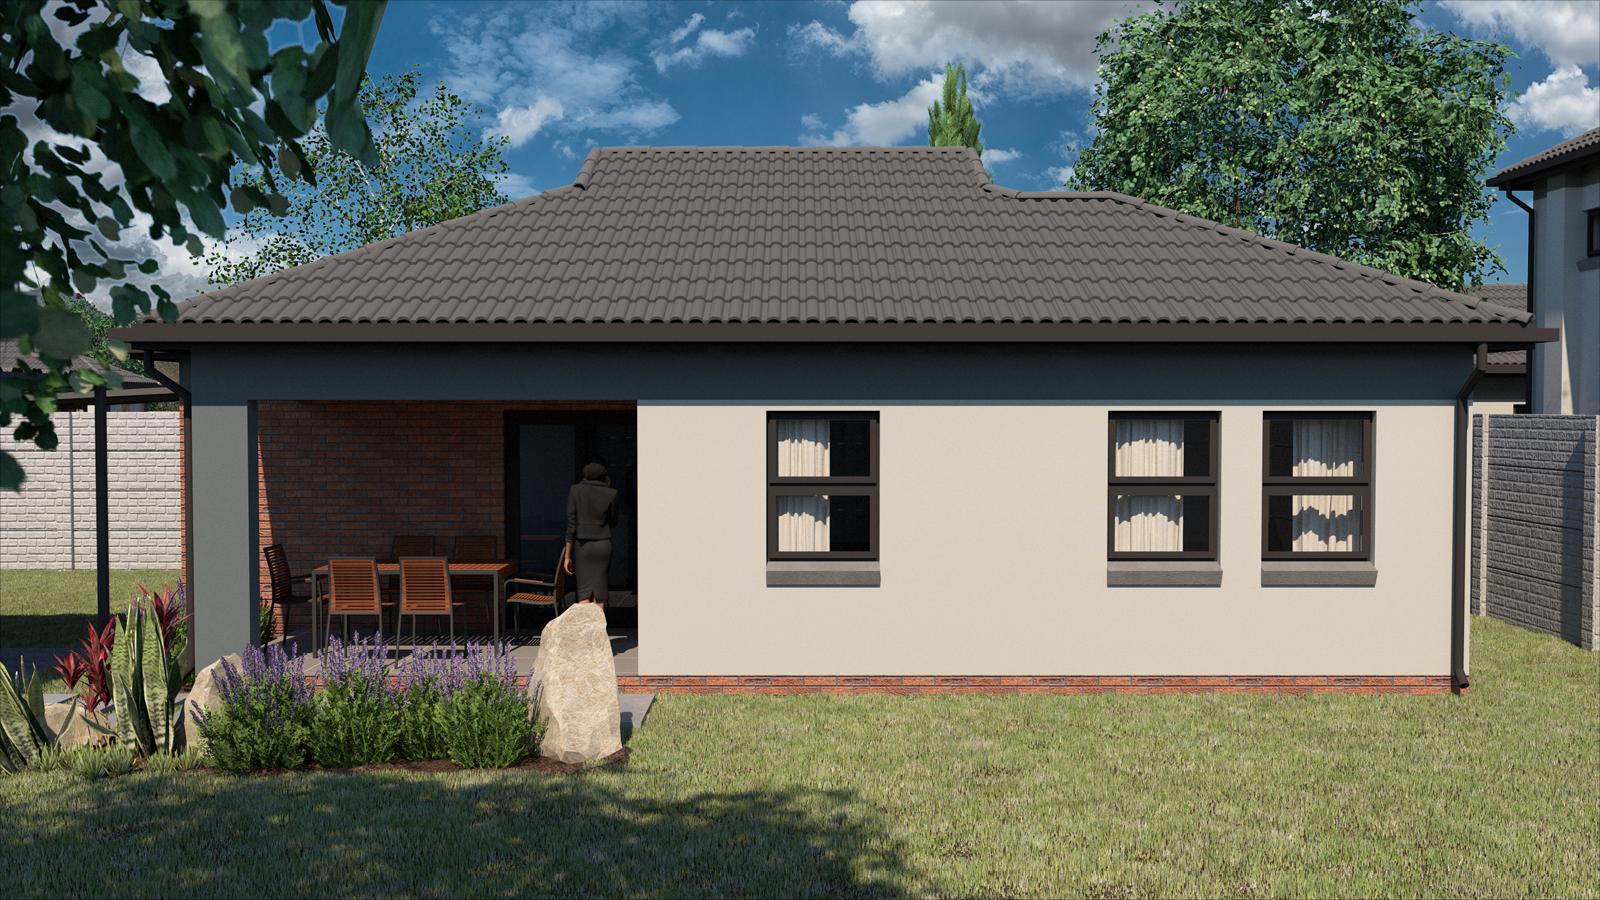 New security estate in Capital View, Pretoria west